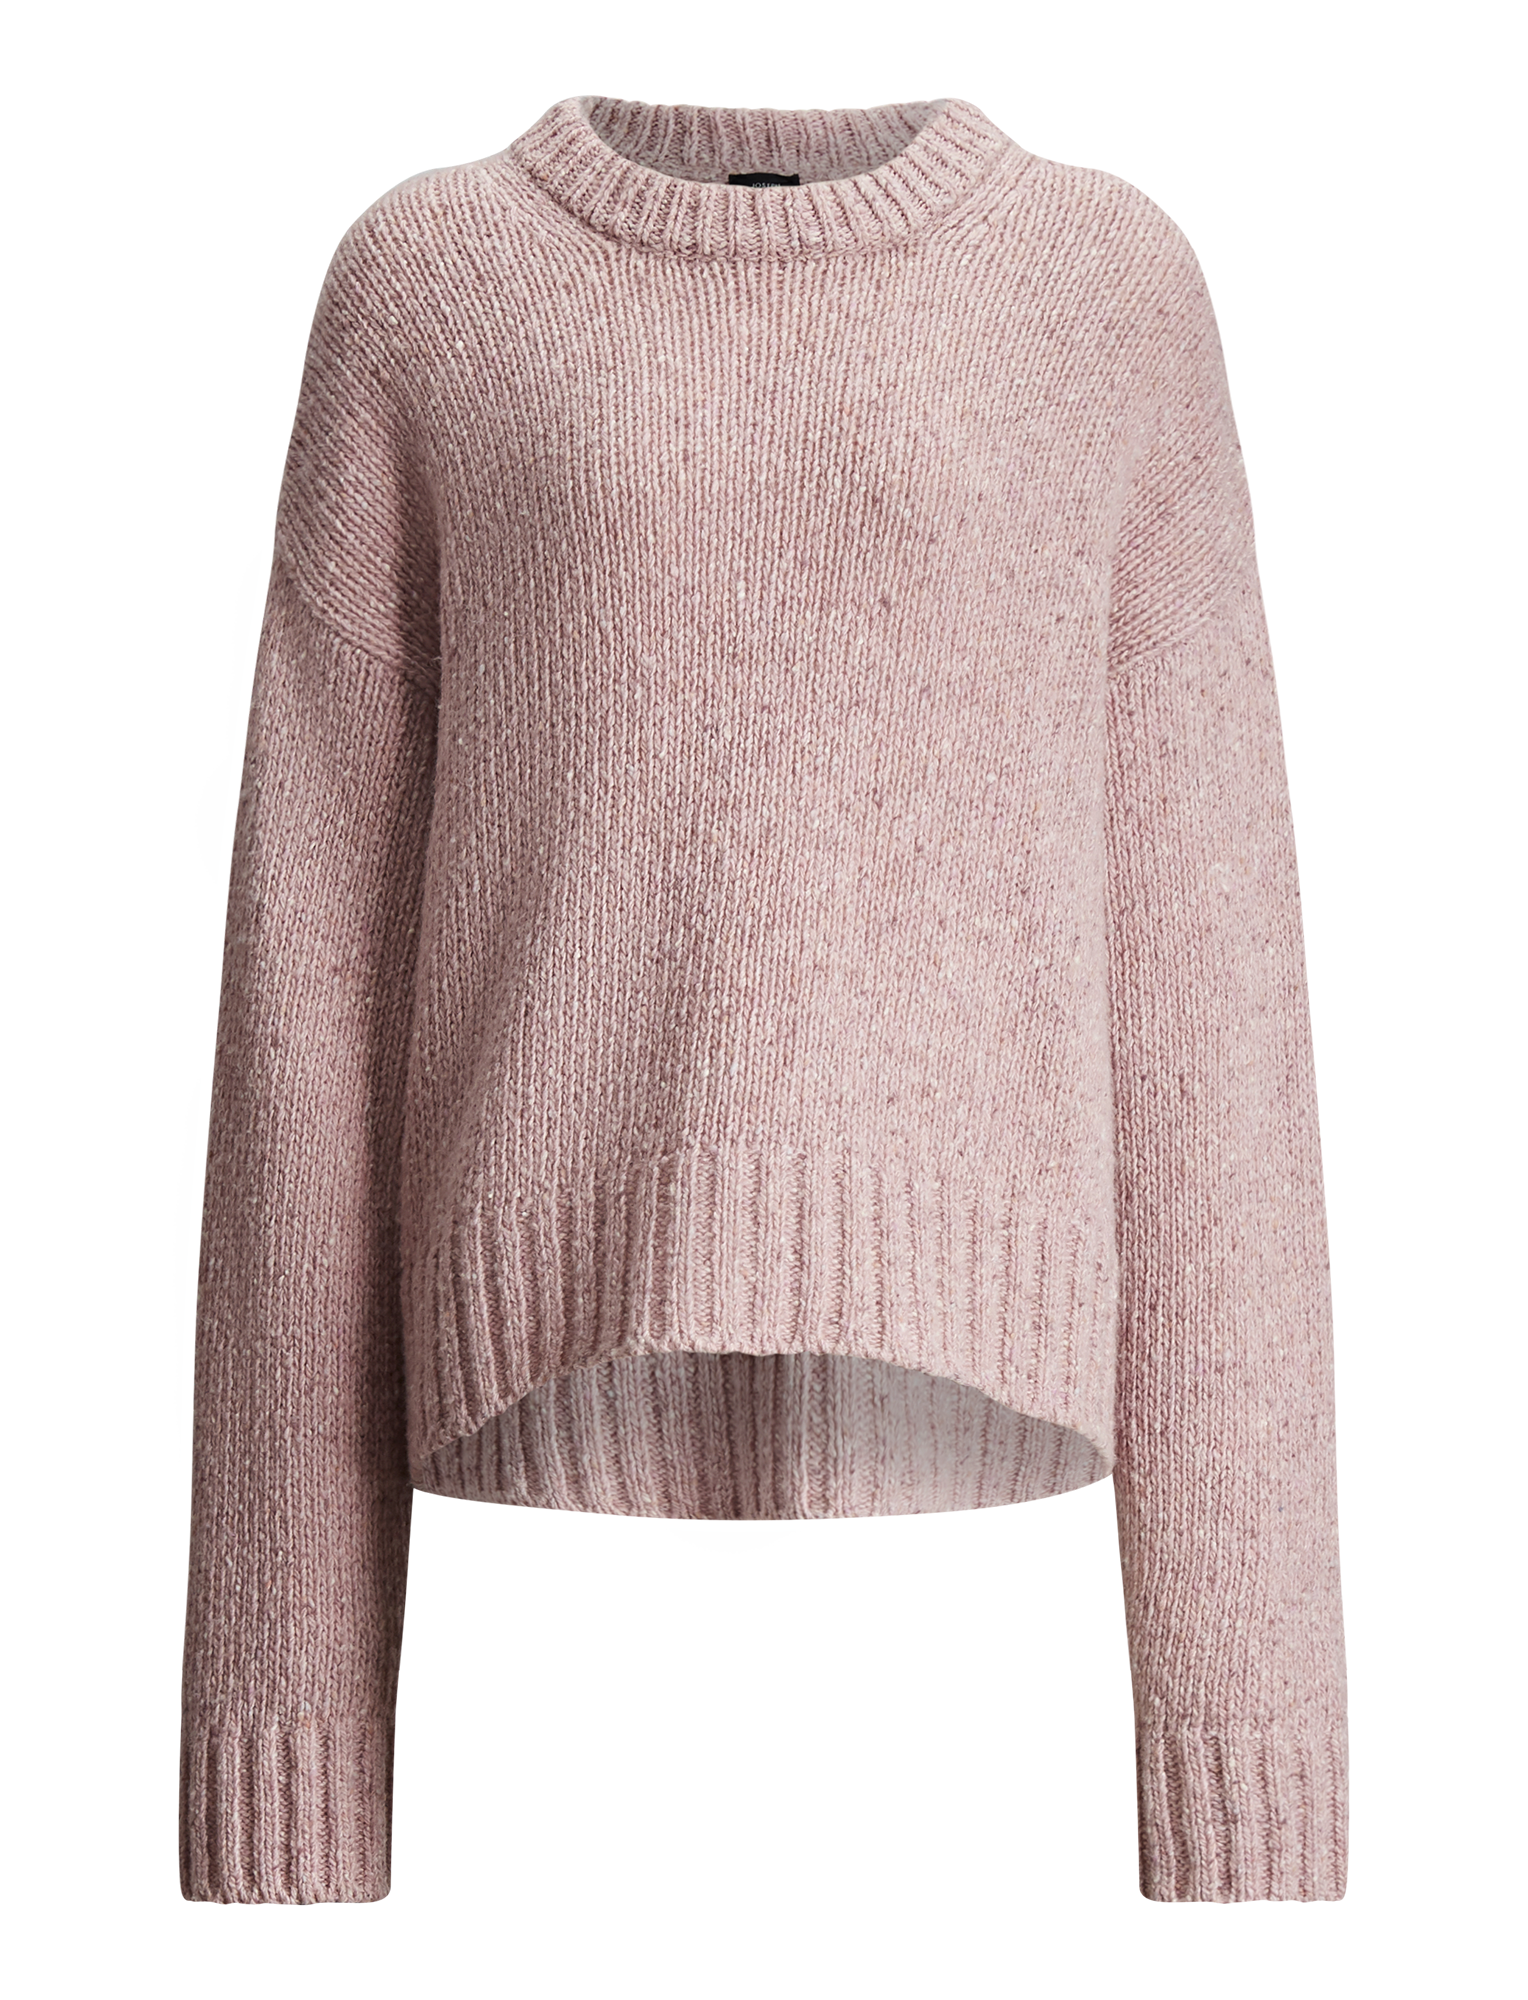 Joseph, Tweed Knit, in